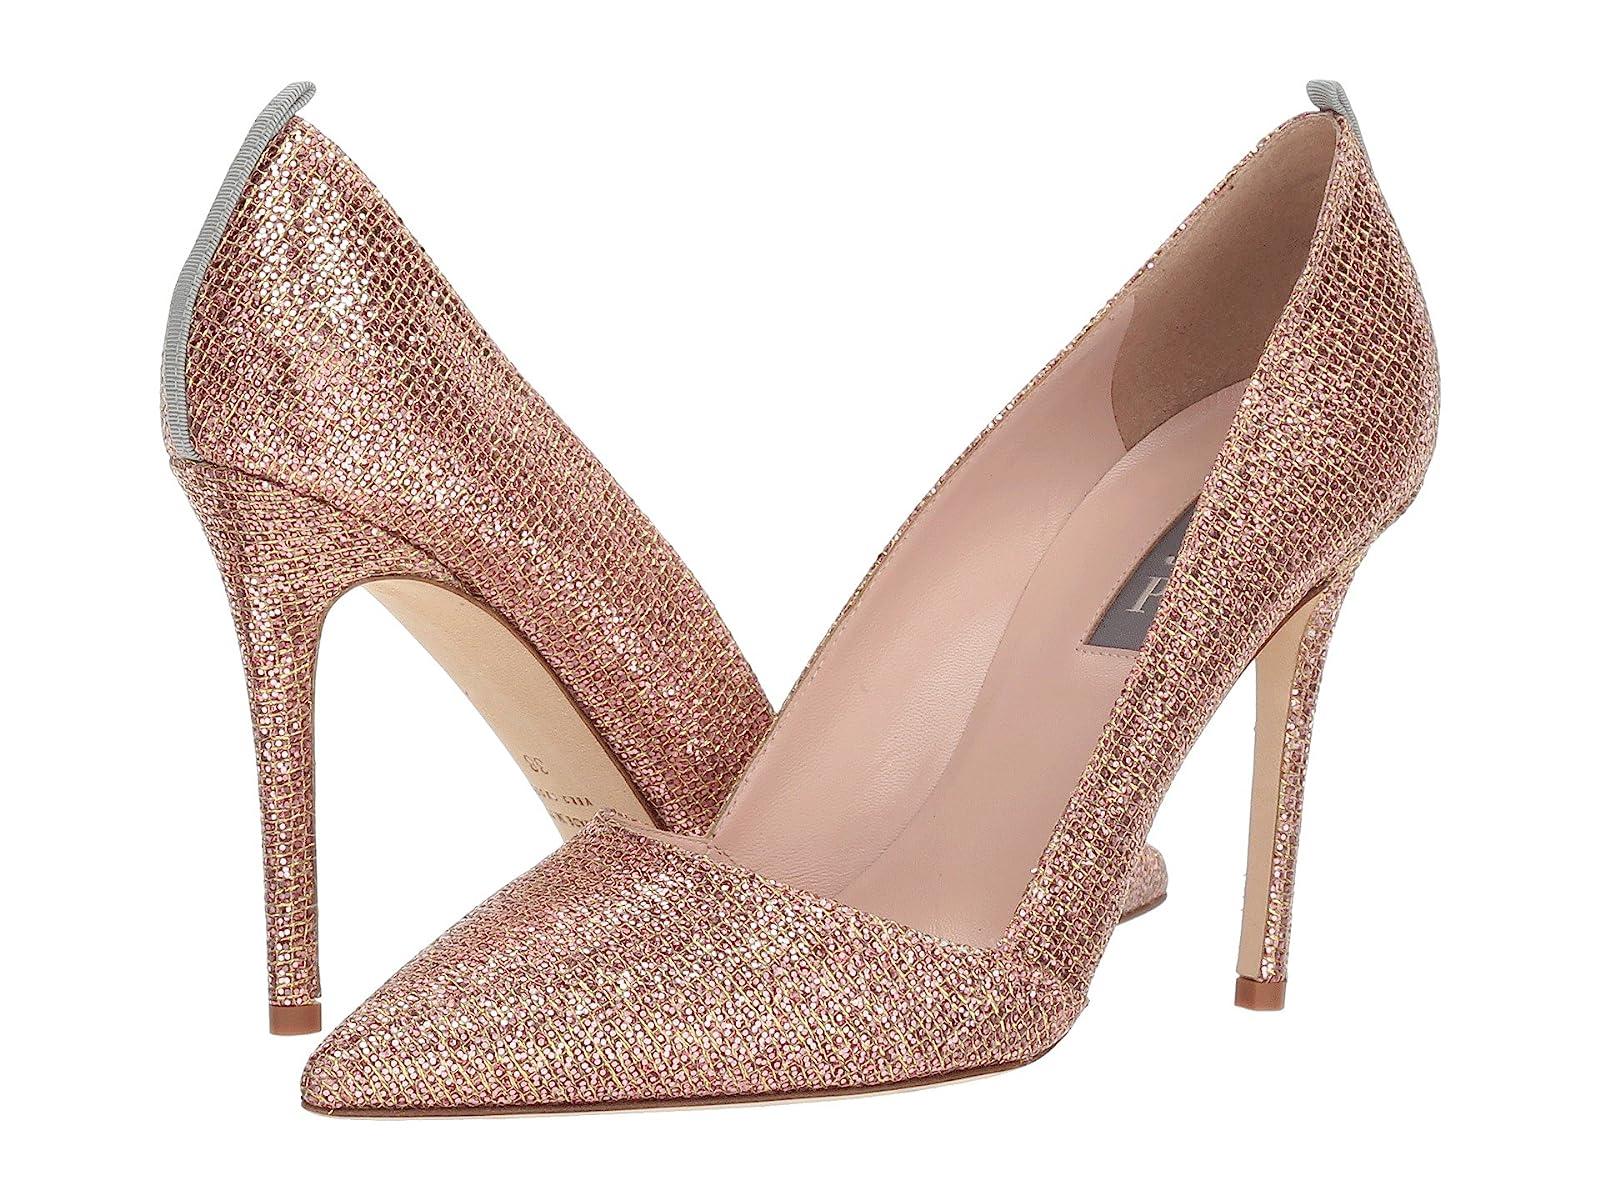 SJP by Sarah Jessica Parker RamplingAtmospheric grades have affordable shoes